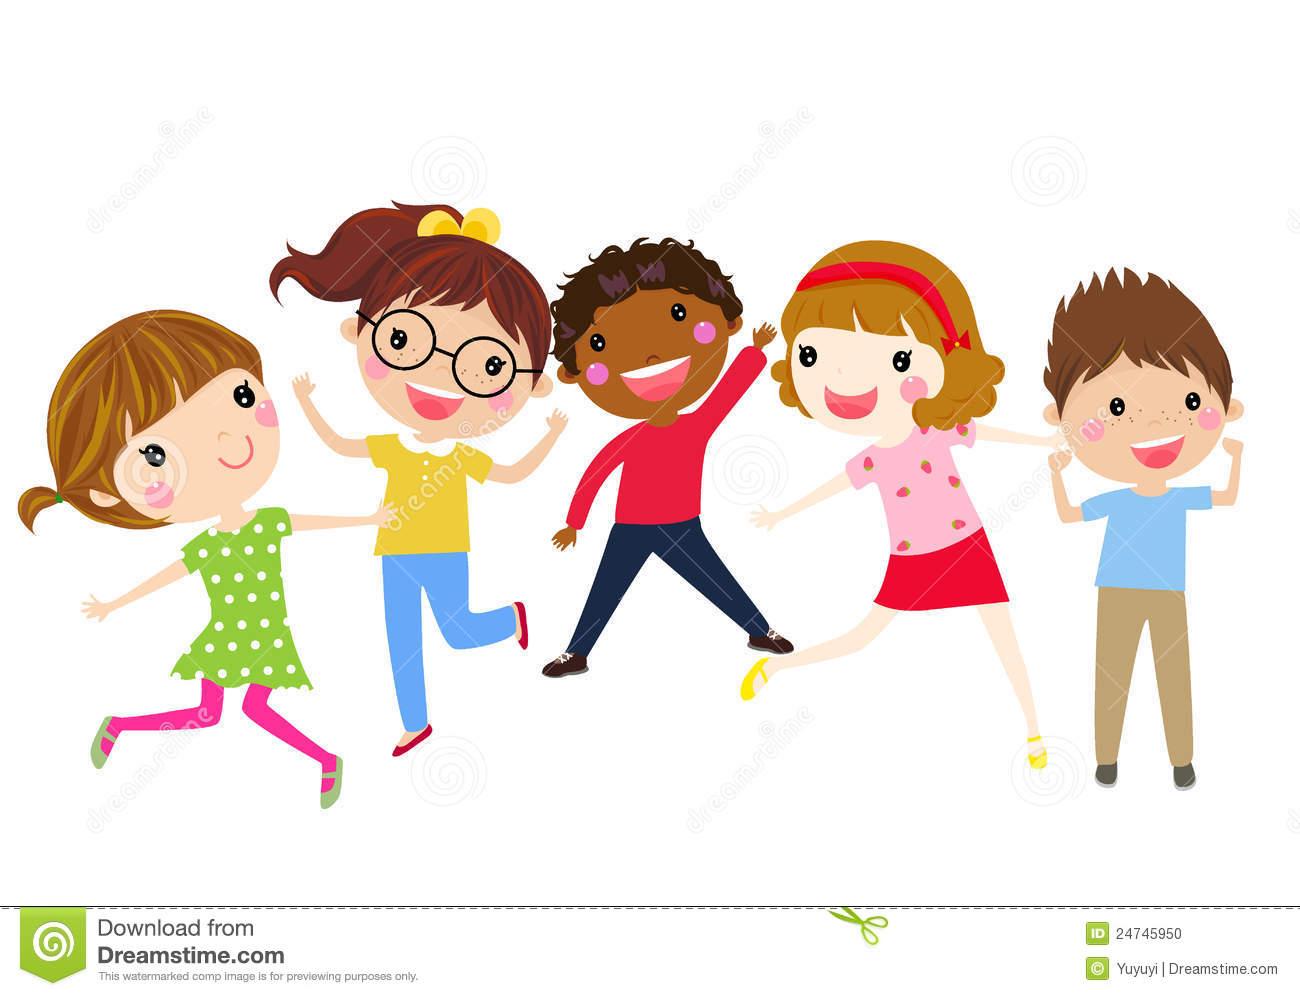 Children fun clipart - Clipground